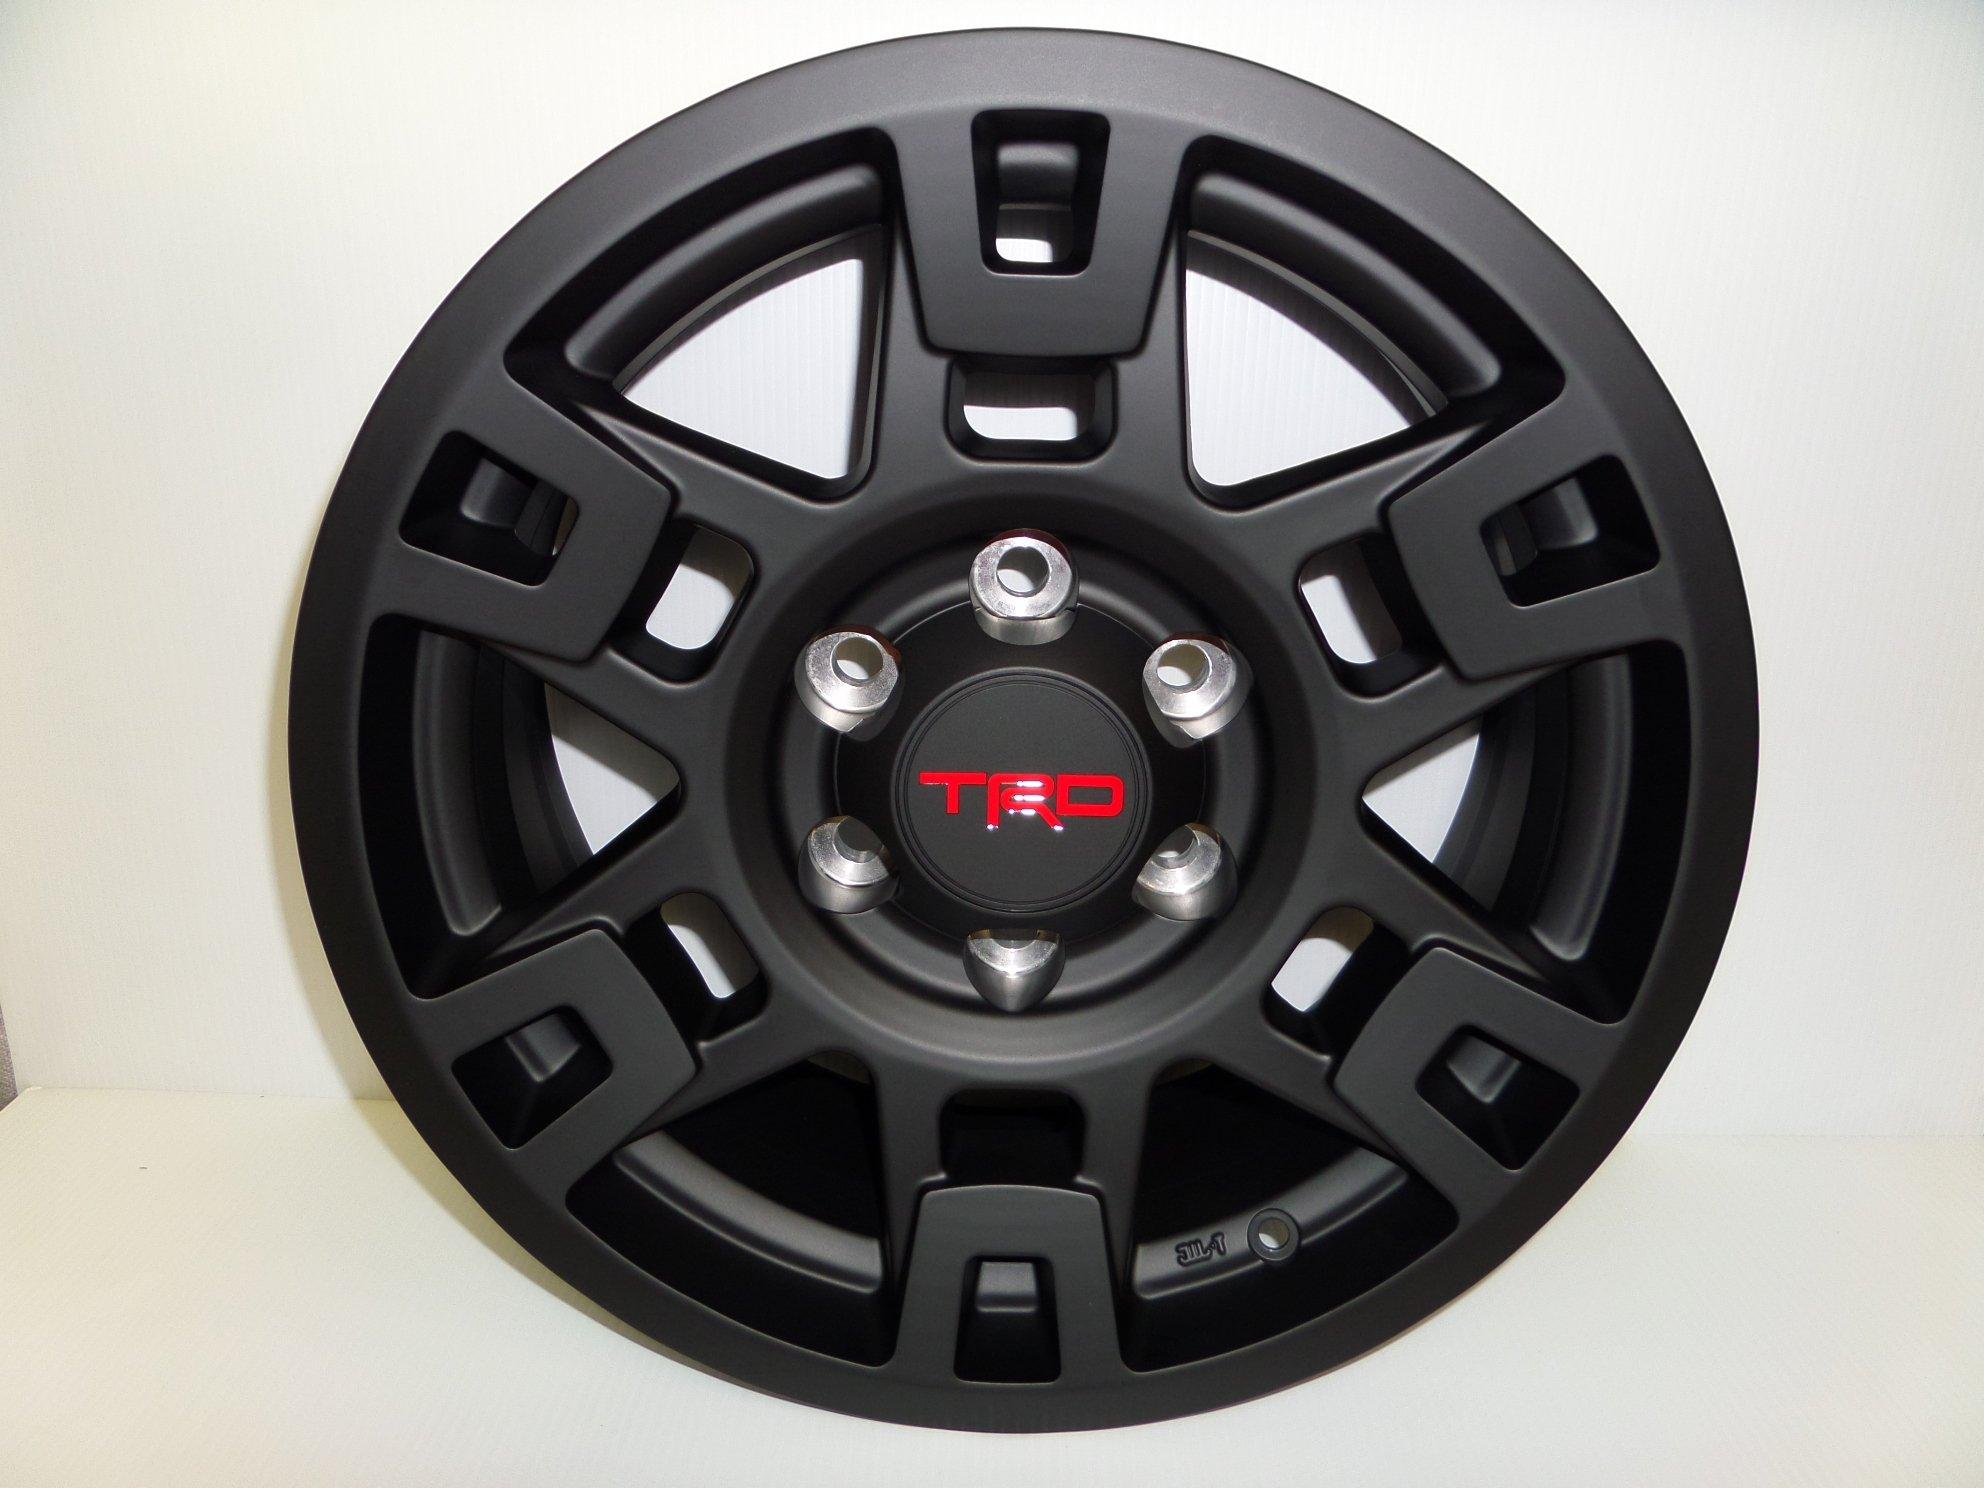 TRD PRO SEMA BLACK ALUMINUM RIM INDIVIDUAL FITS MULITPLE TOYOTA VEHICLES by Toyota (Image #1)